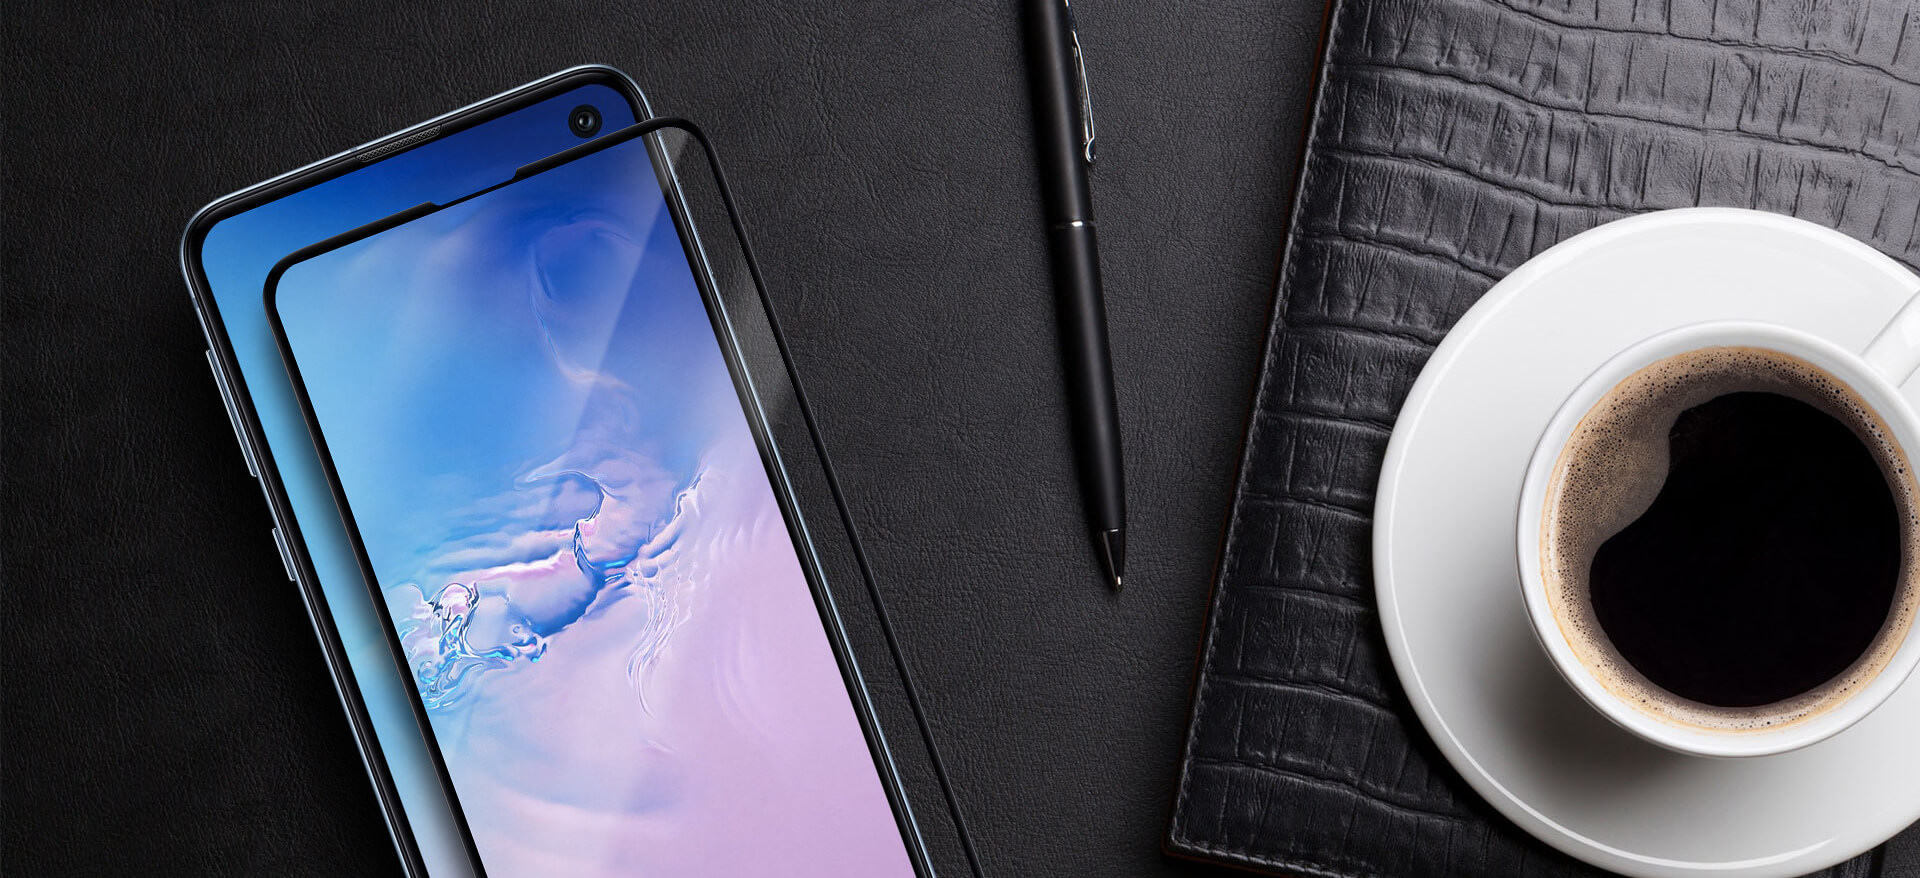 VMAX Samsung Galaxy S10e 3D Full Cover Tempered Glass Screen Protector